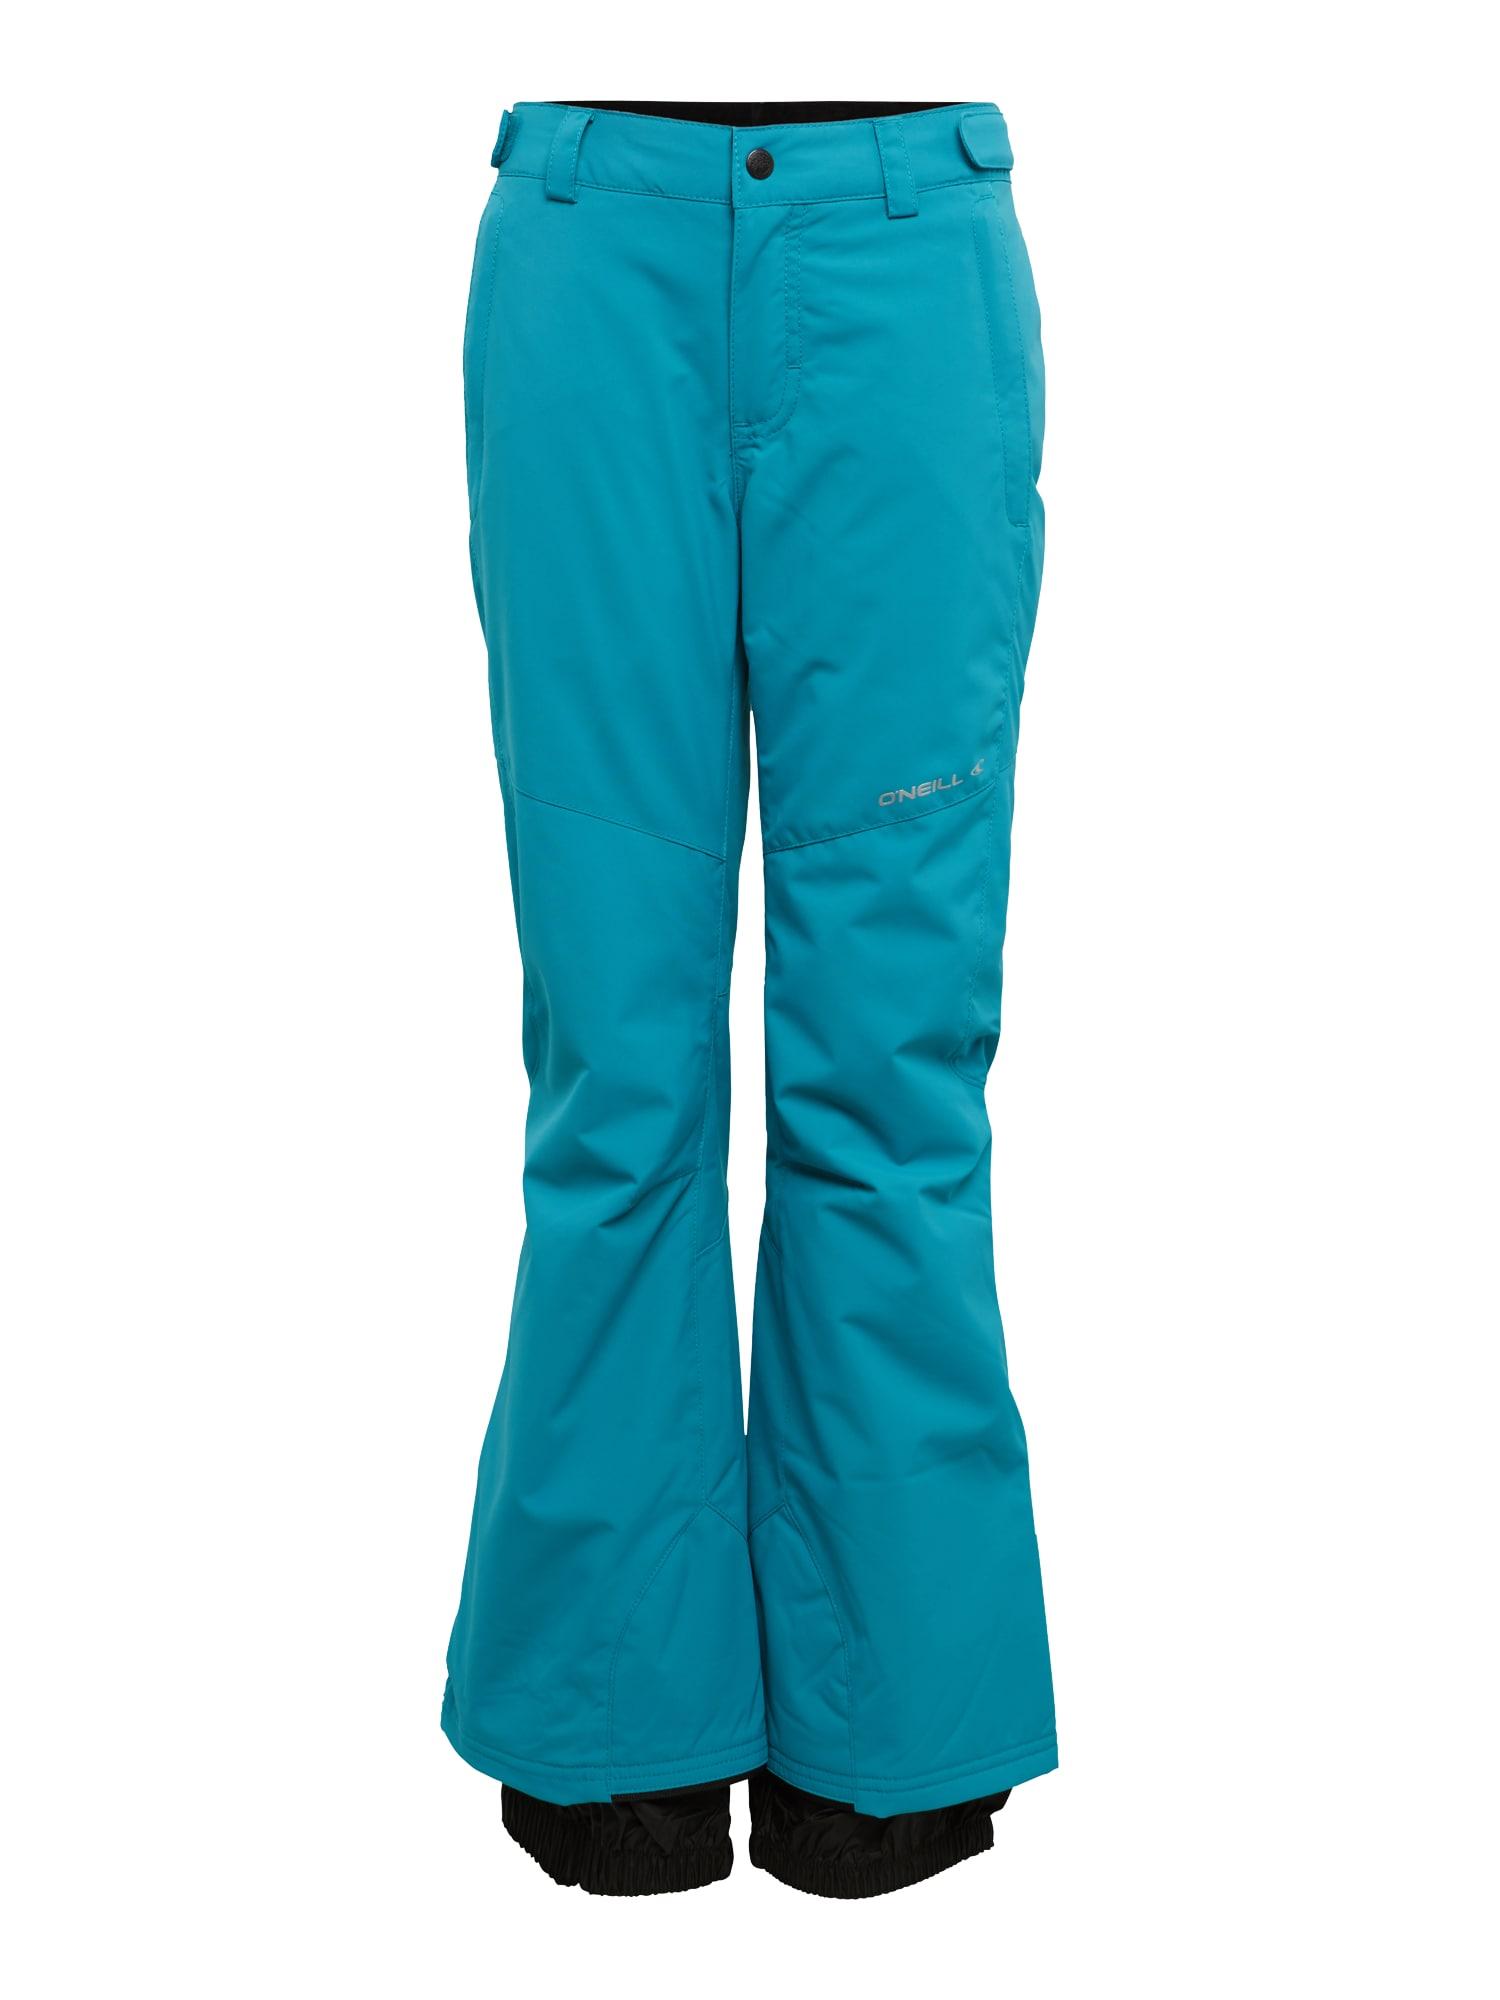 ONEILL Outdoorové kalhoty PG CHARM petrolejová O'NEILL